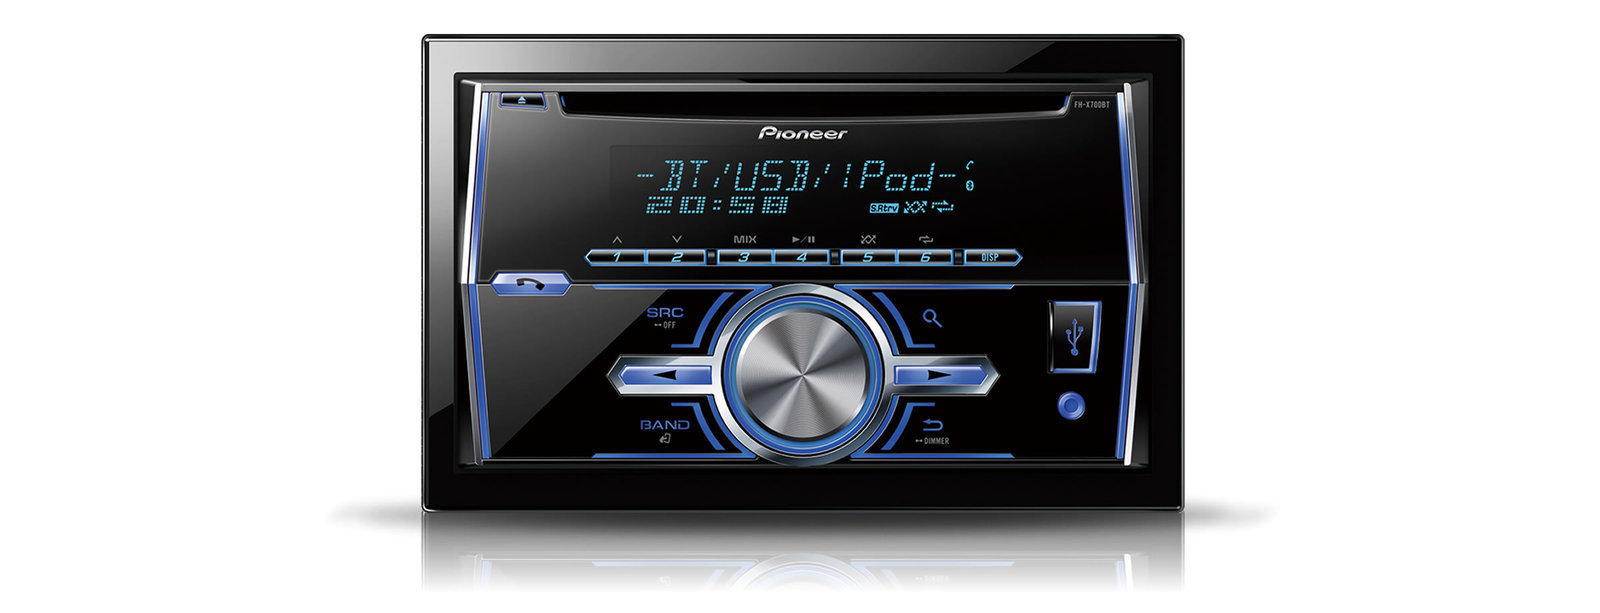 Pioneer Fh-x700bt